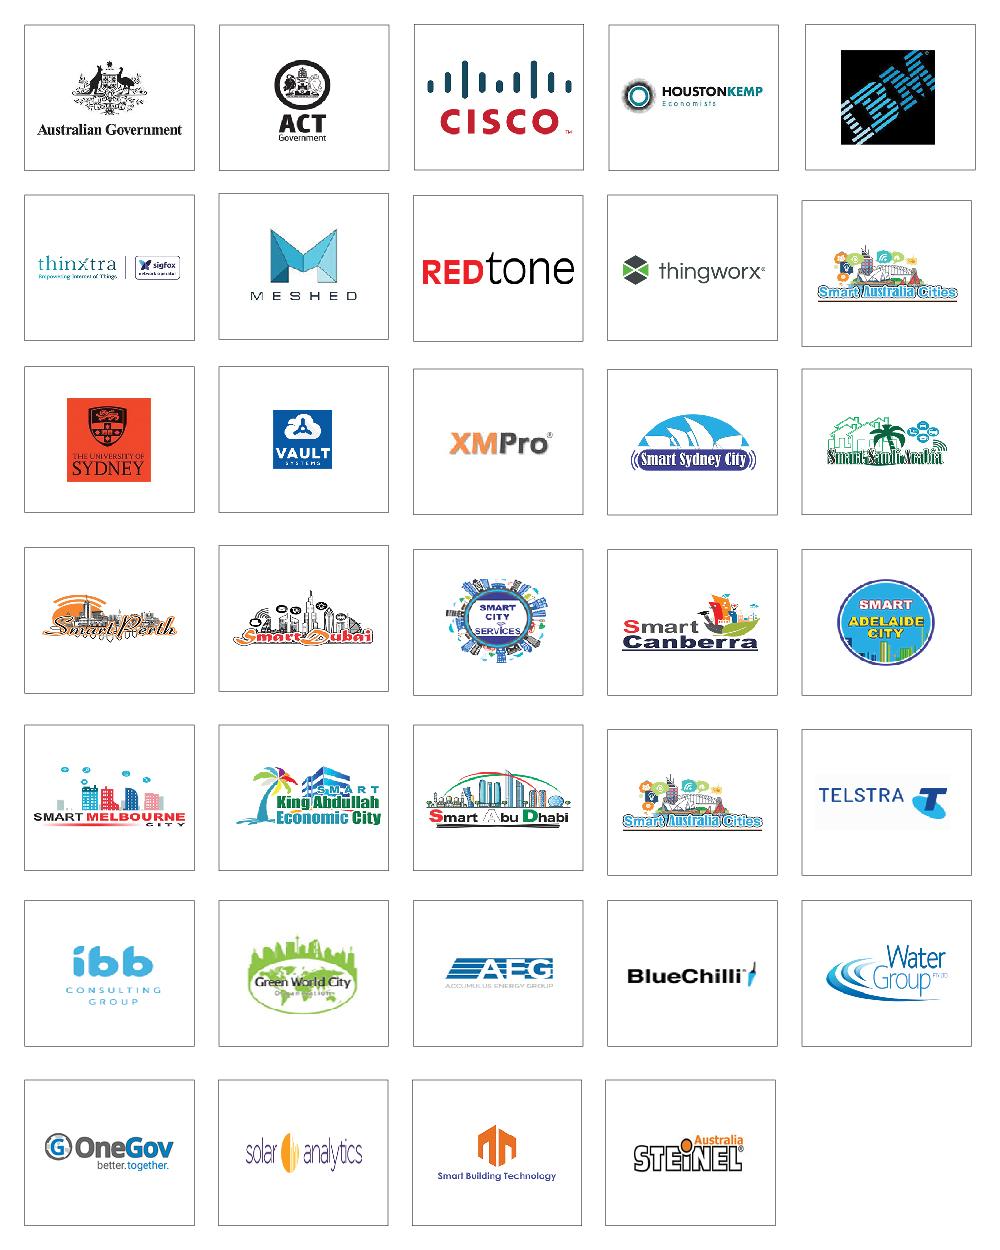 sponsorcompanies201628129.jpg